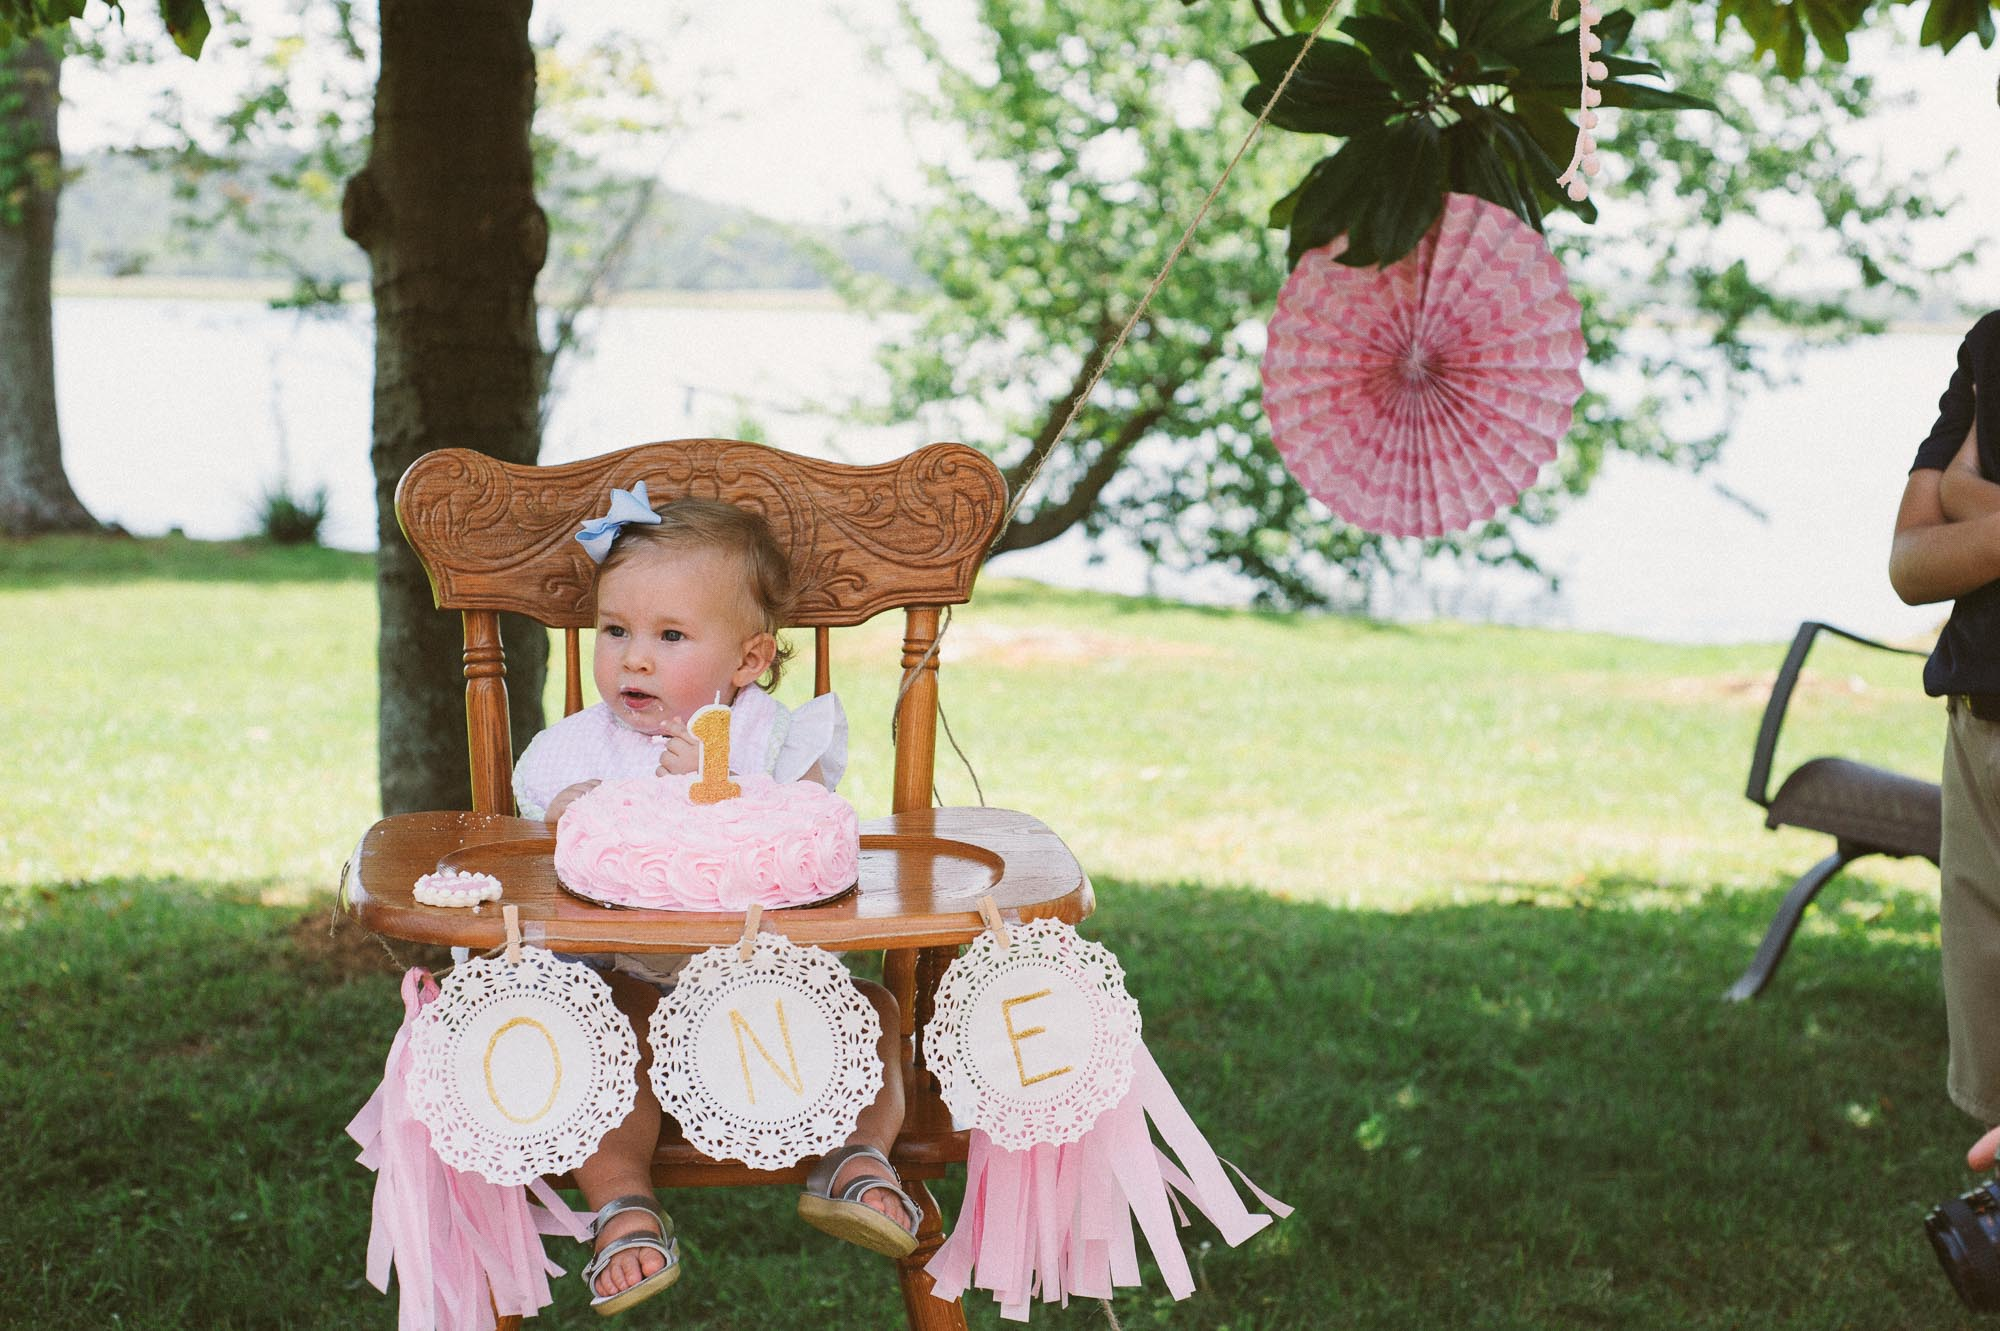 m.newsom-photography-one-year-old-girls-birthday-party-ideas-alice-in-wonderland (36 of 42).jpg